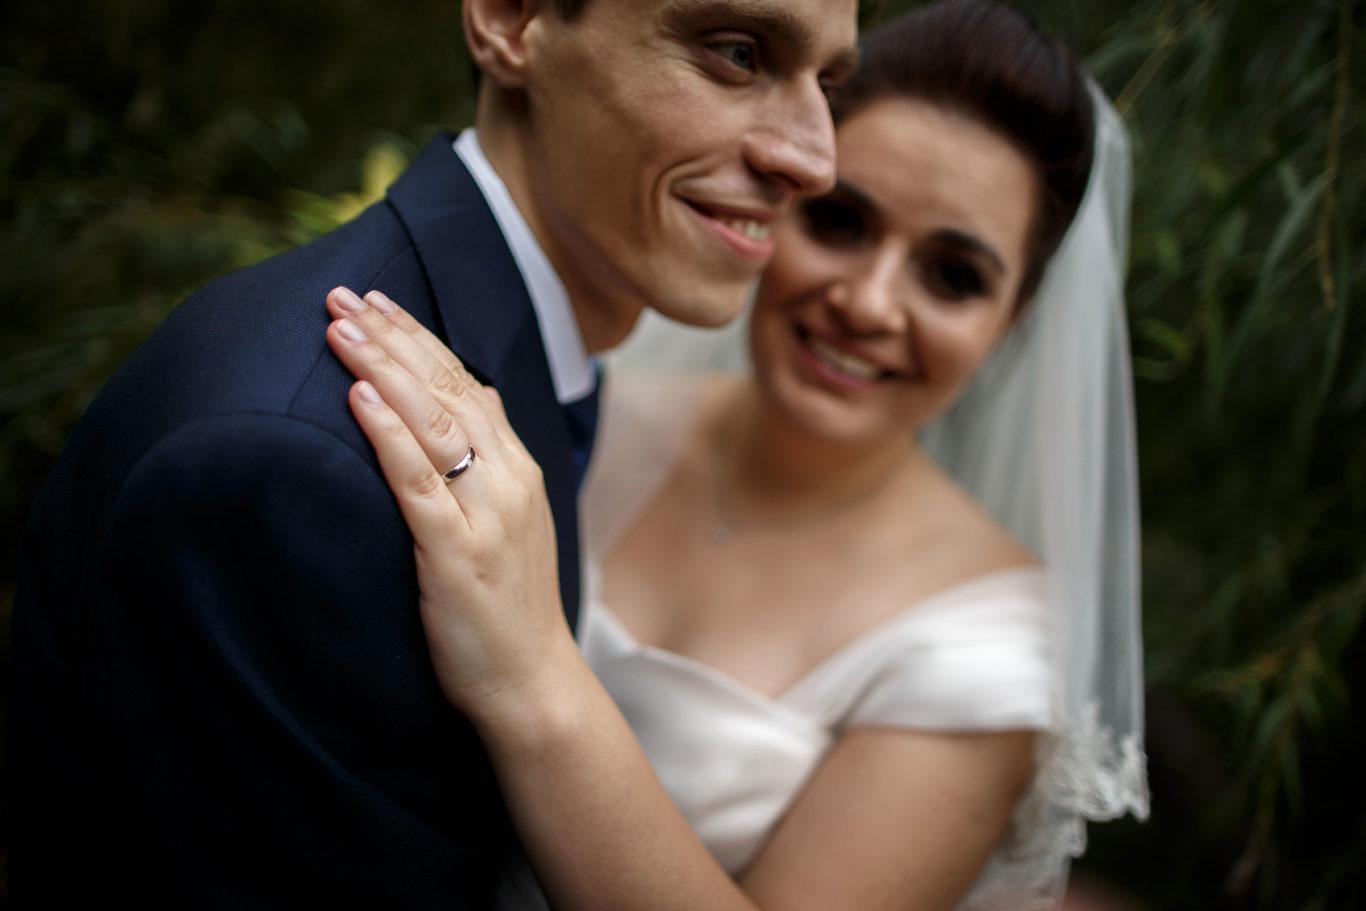 0364-Fotografie-nunta-Roxana-Costin-fotograf-Ciprian-Dumitrescu-DC1X0870